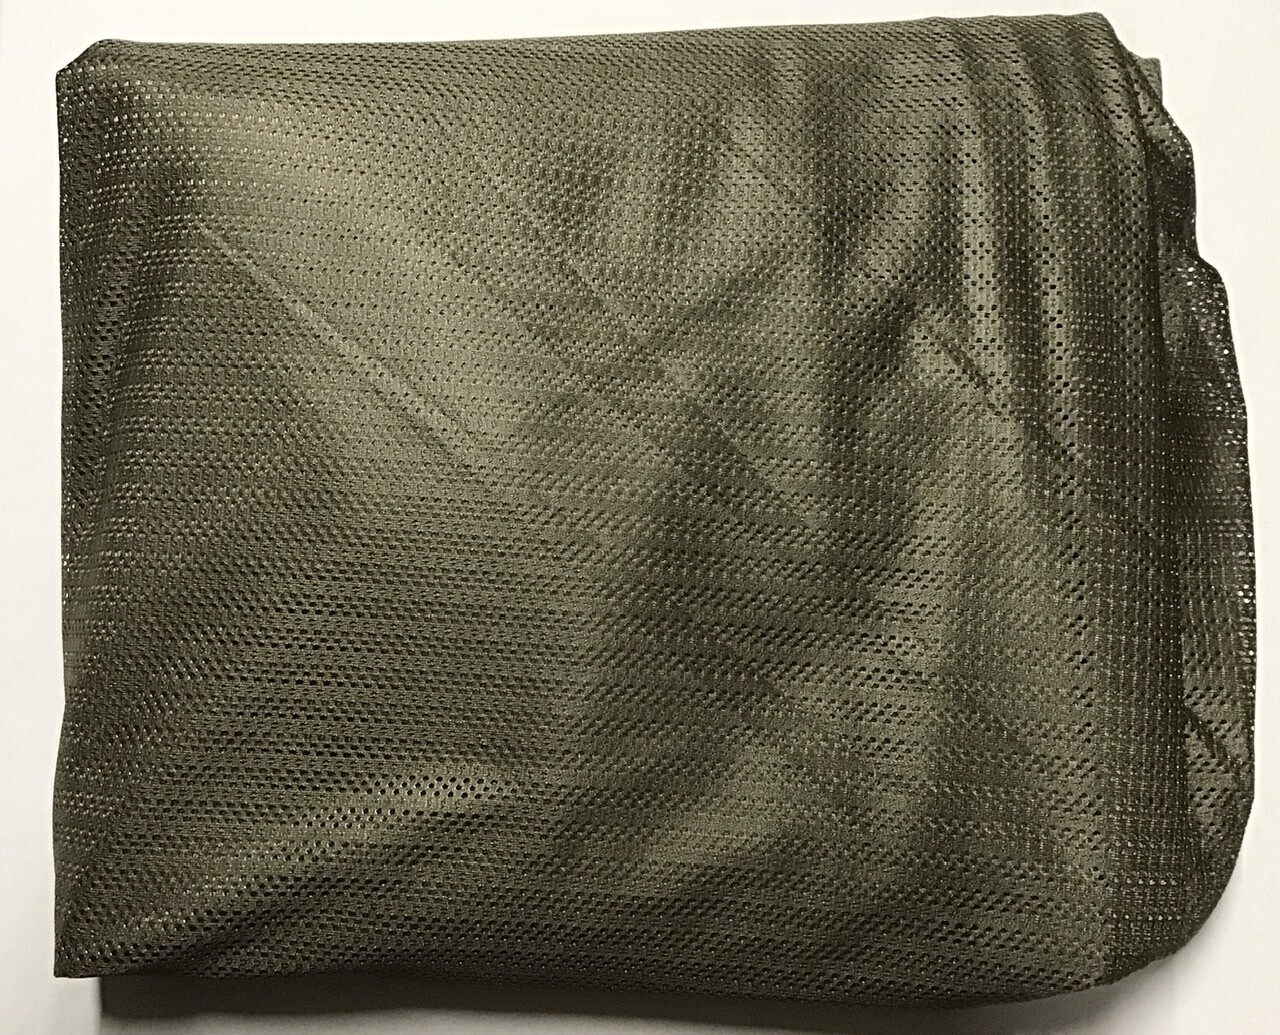 Fabric: Olive Green Mesh